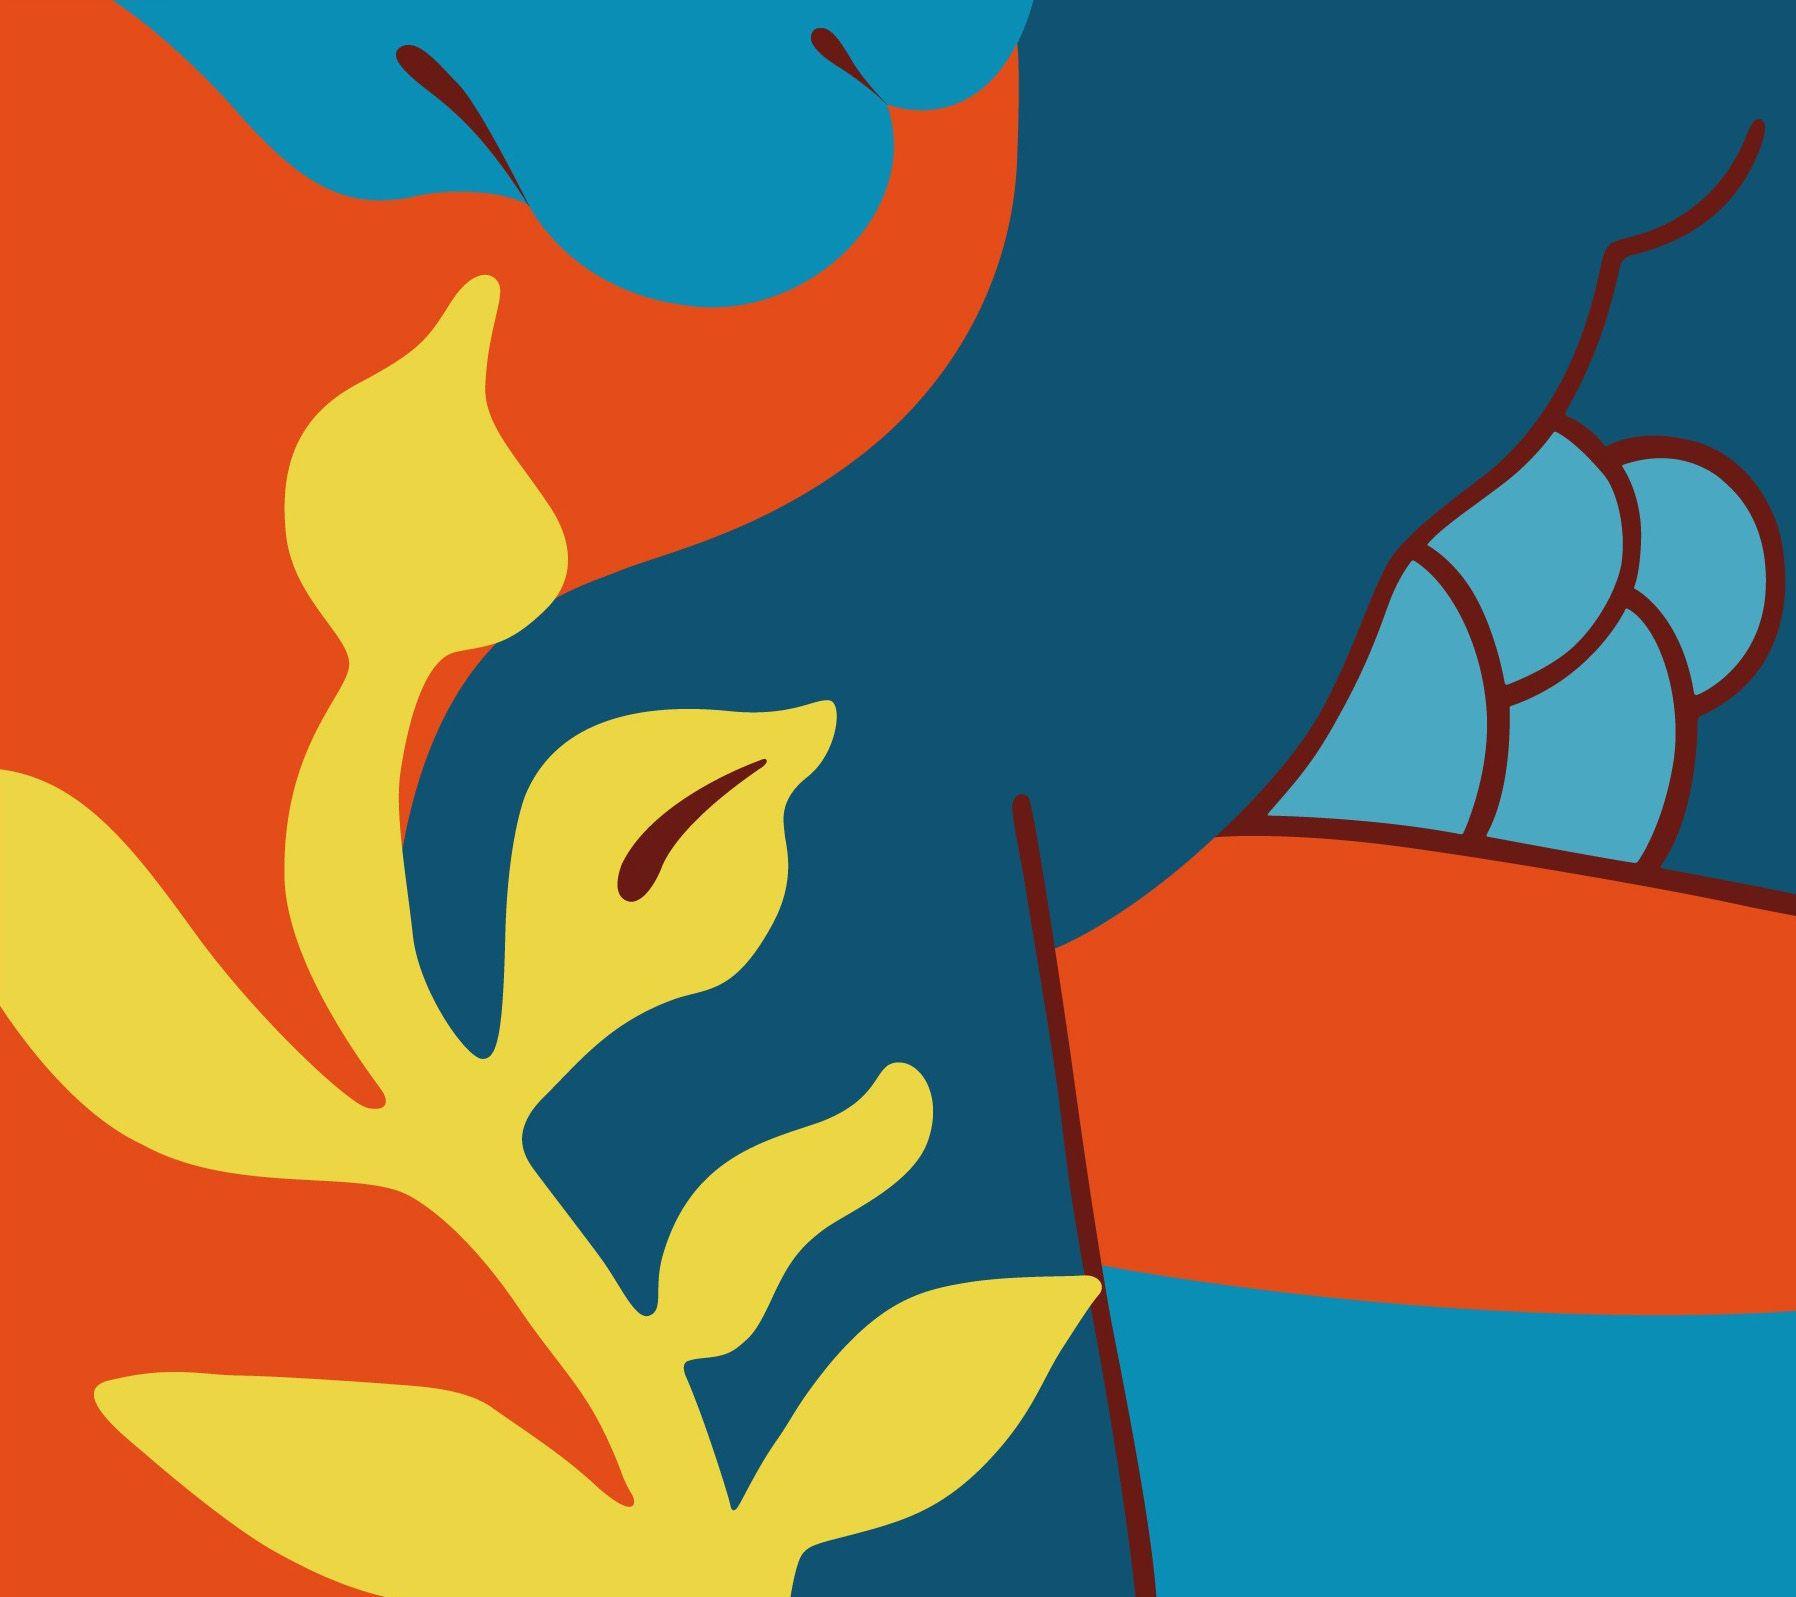 Lucie Bennett Orange Blossom On Eyestorm Symbolic